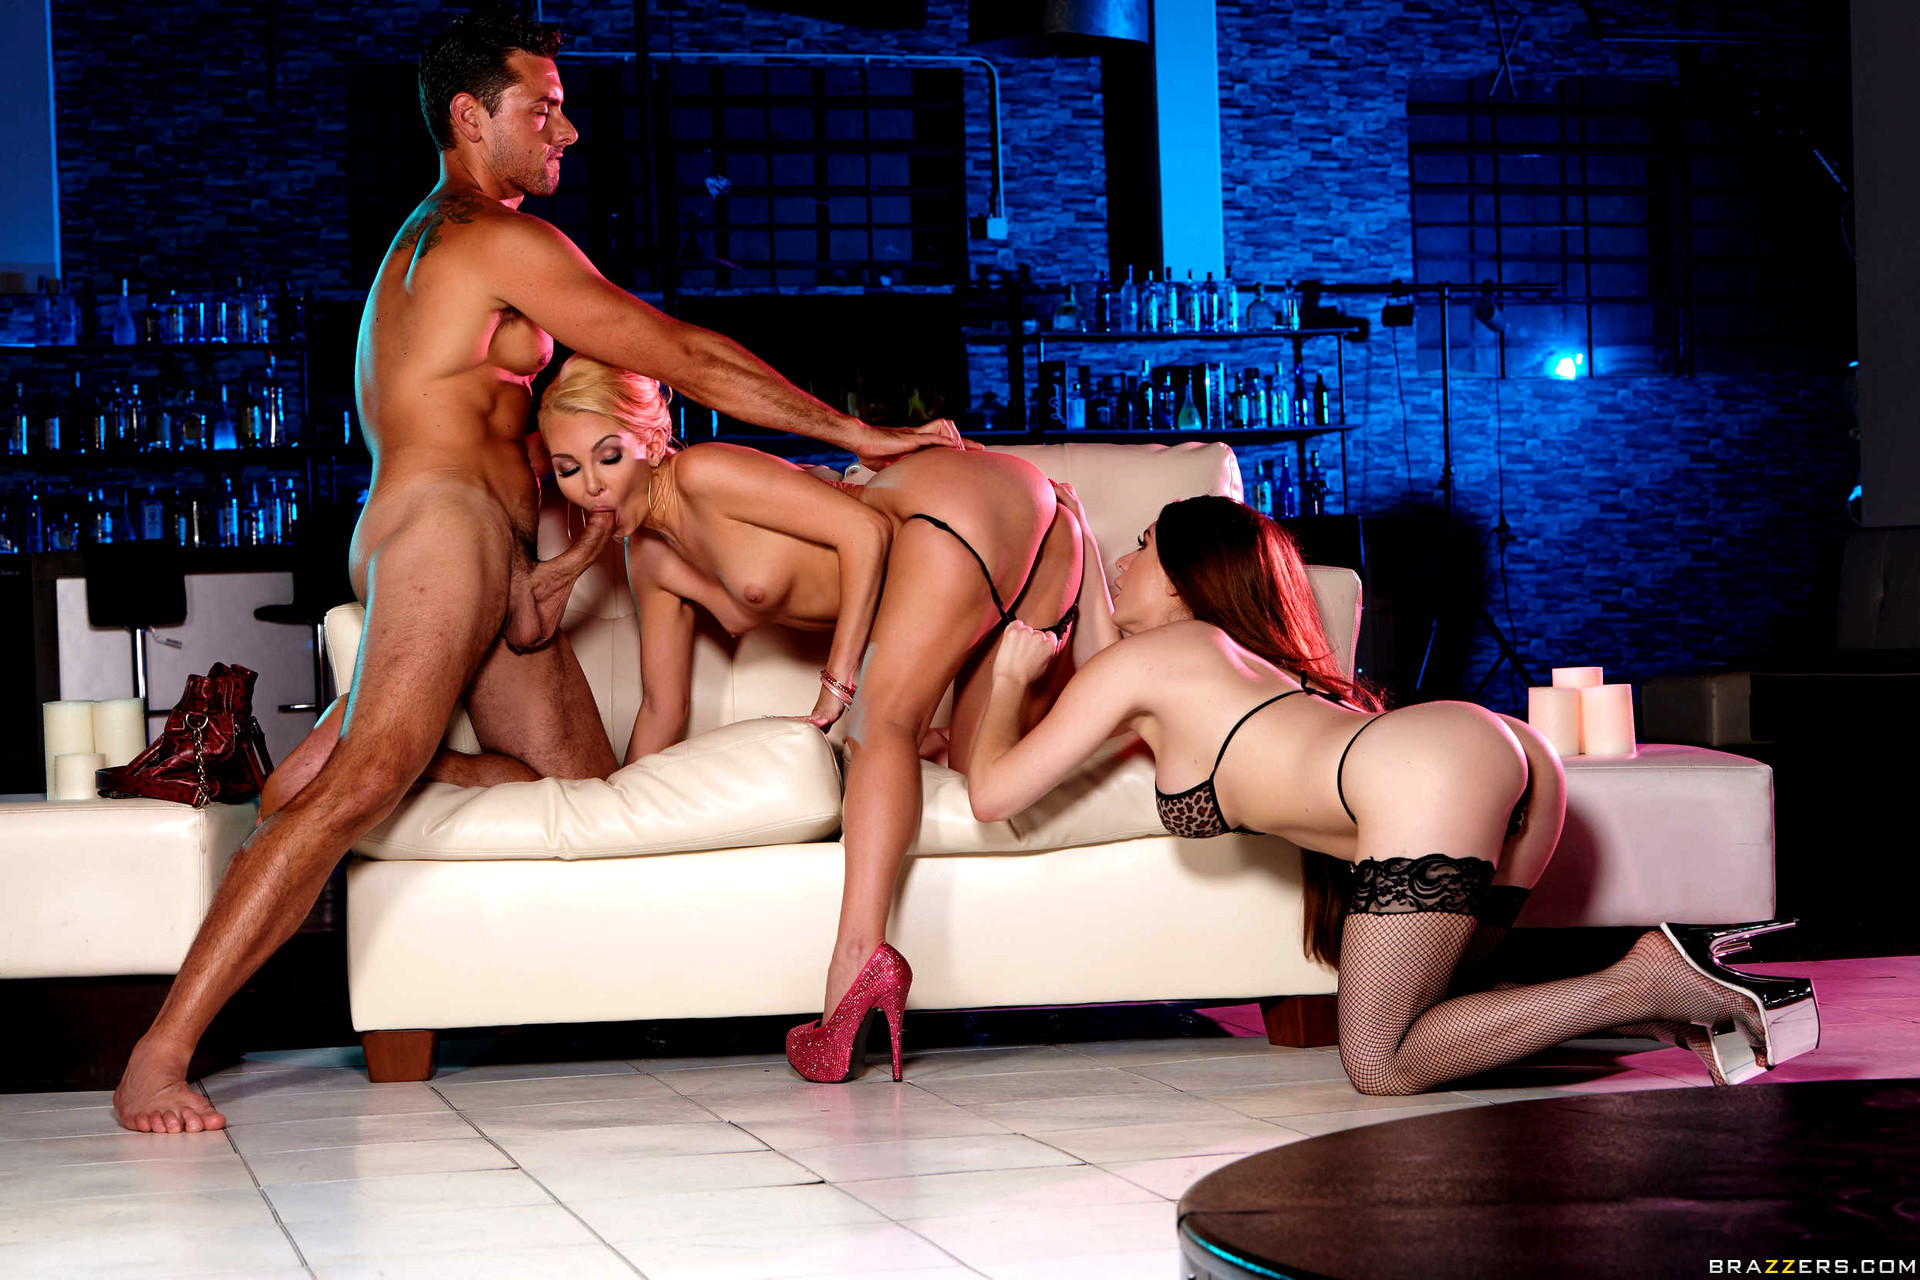 Hot women ready seduction XXX women local dating online